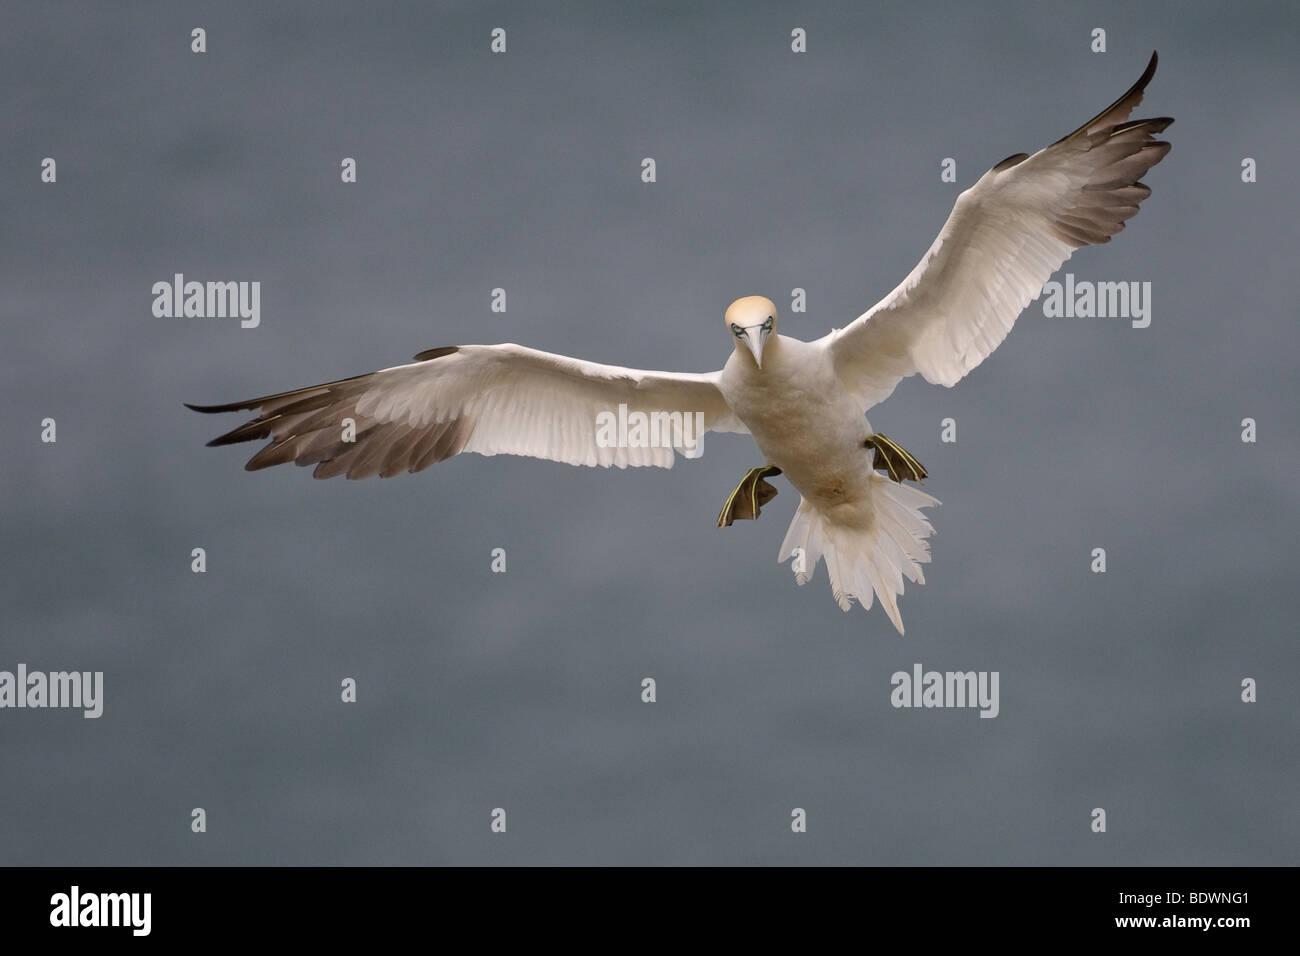 Northern gannet Morus bassanus adult in flight. - Stock Image